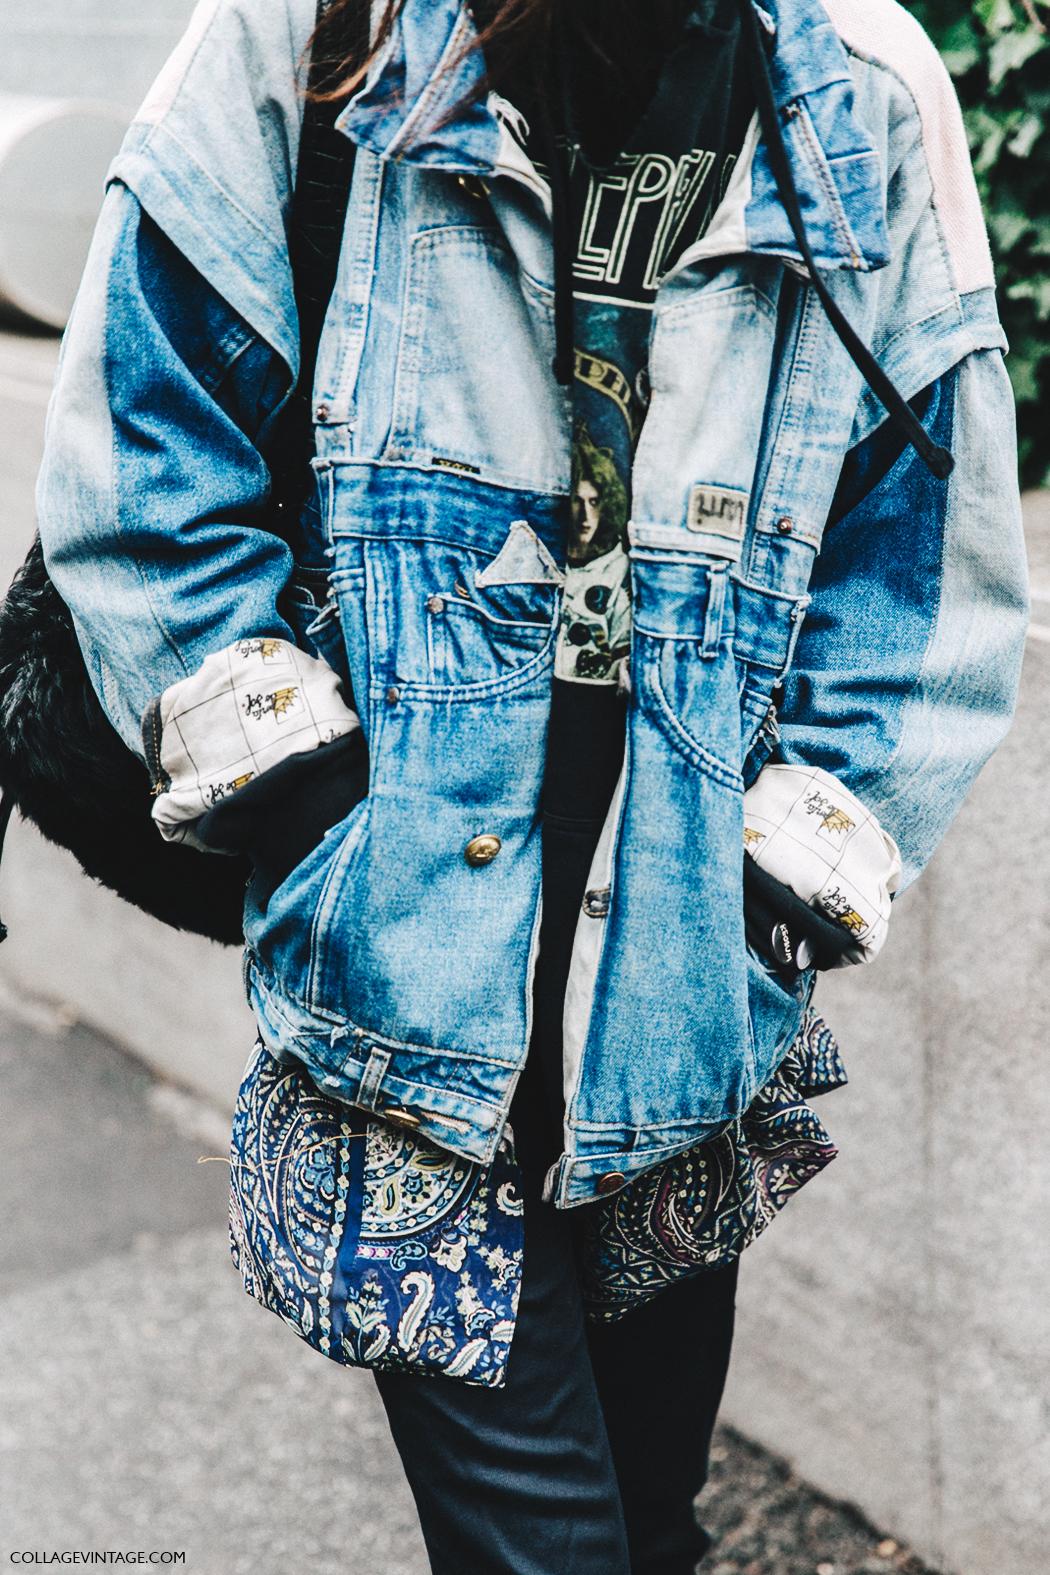 Milan_Fashion_Week_Fall_16-MFW-Street_Style-Collage_Vintage-Denim_Patchwork-1